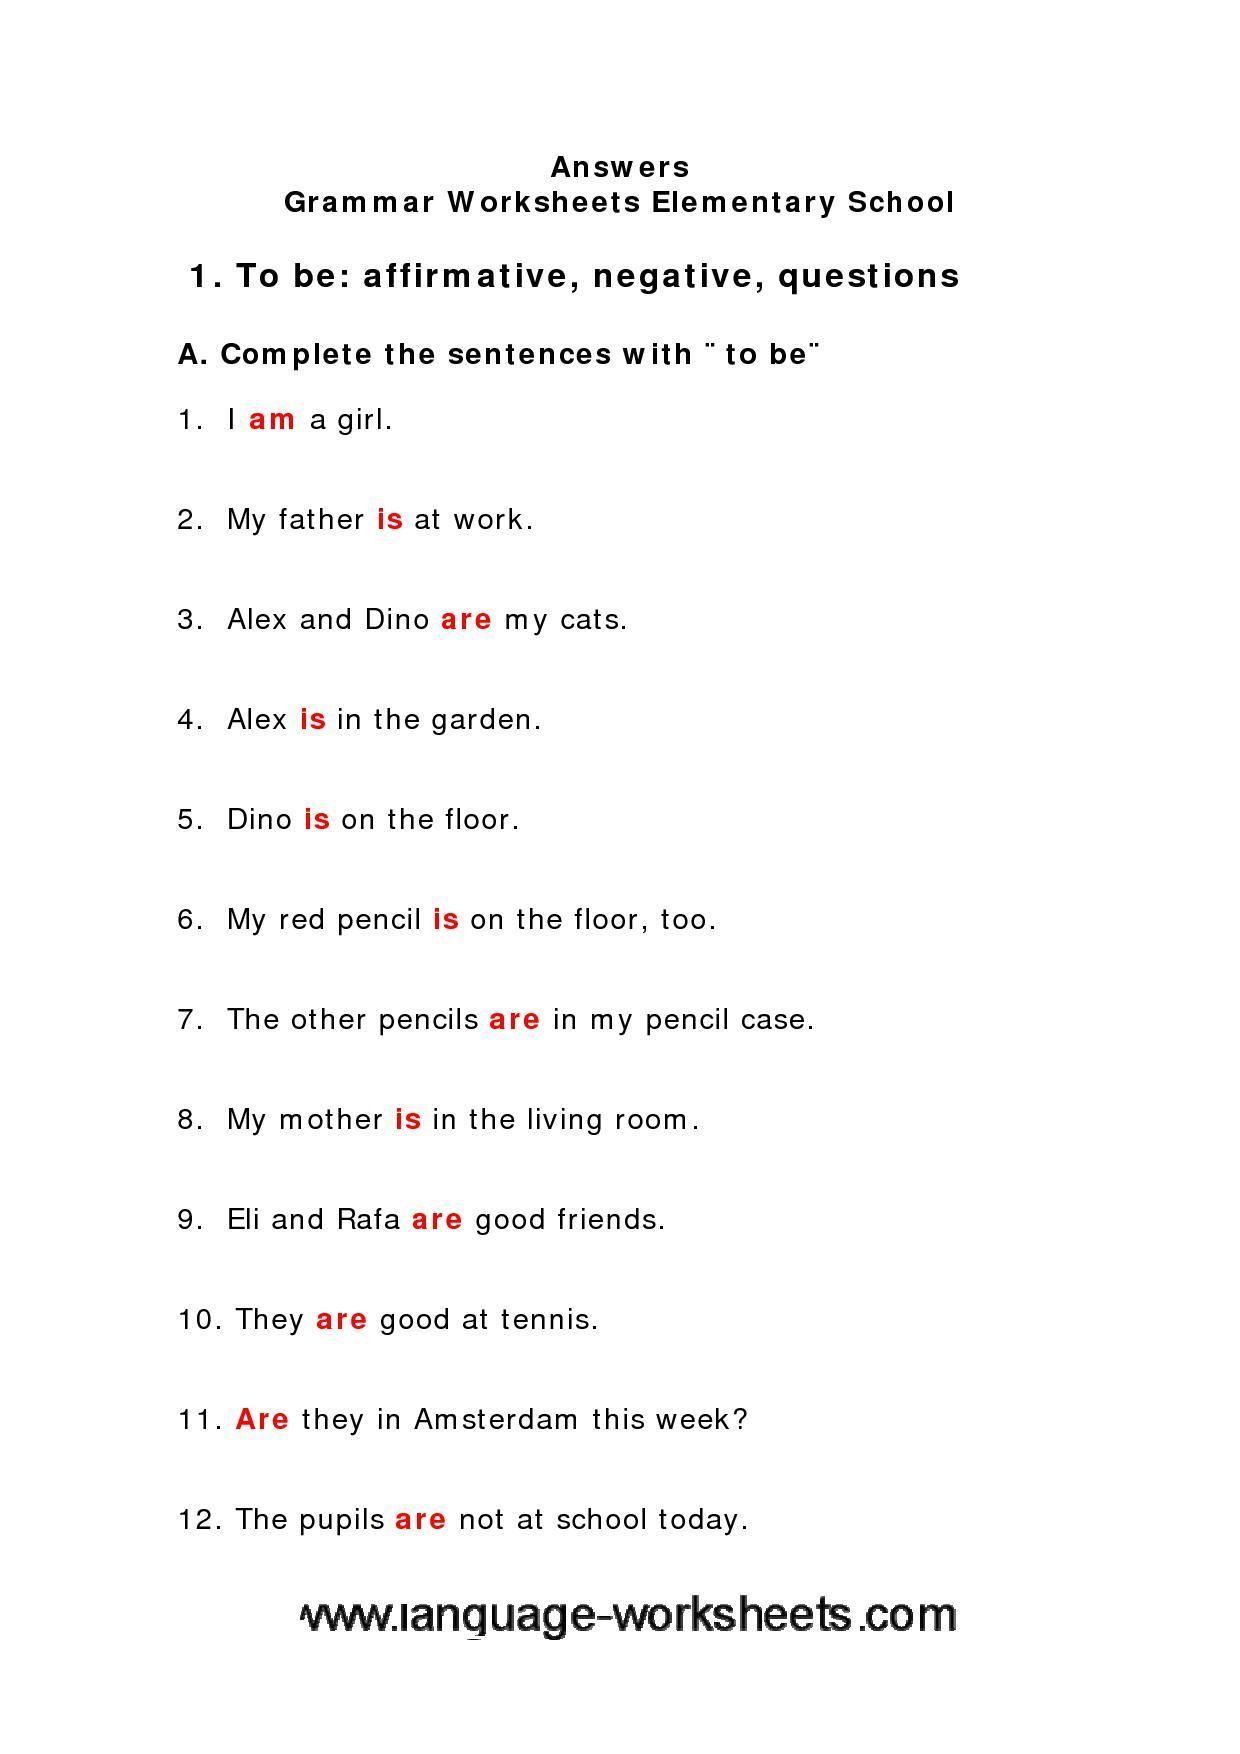 Grammar Worksheets Middle School 648414